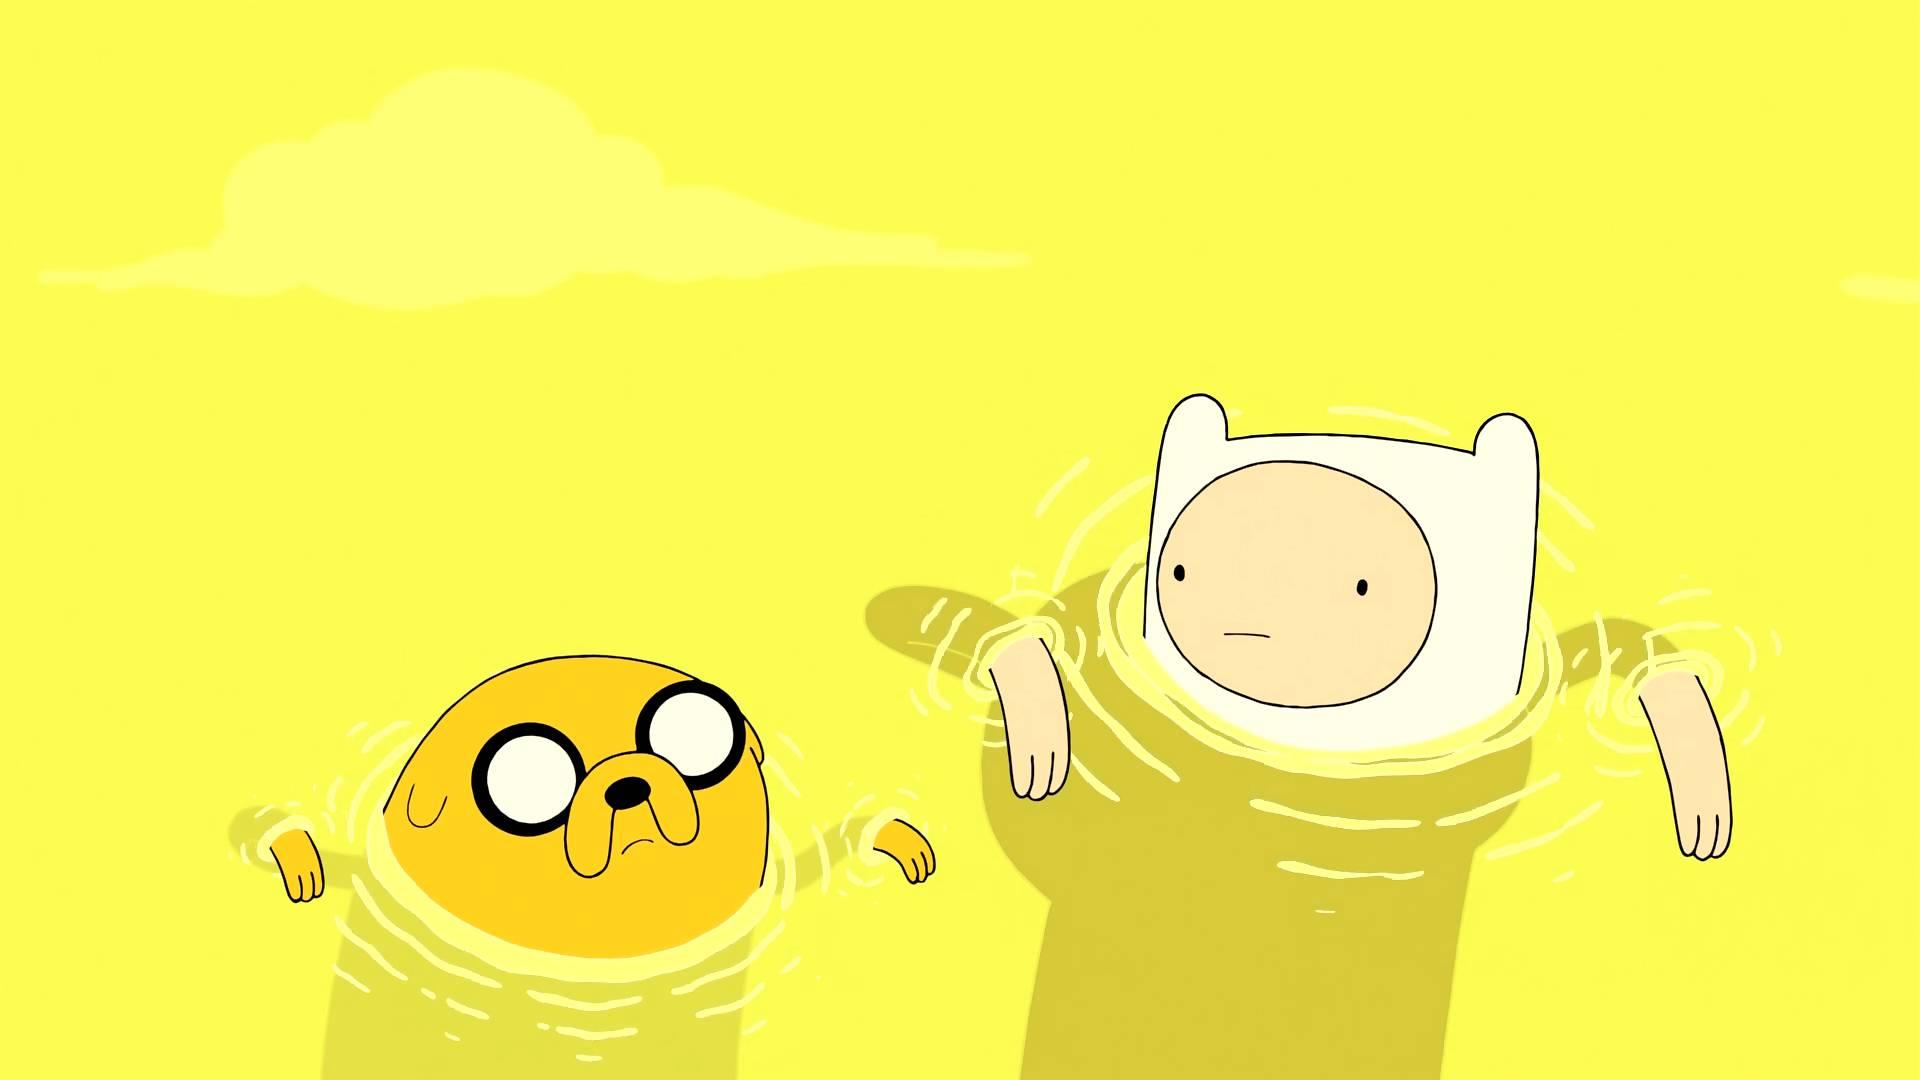 finn and jake 2   Adventure Time Wallpaper 1920x1080